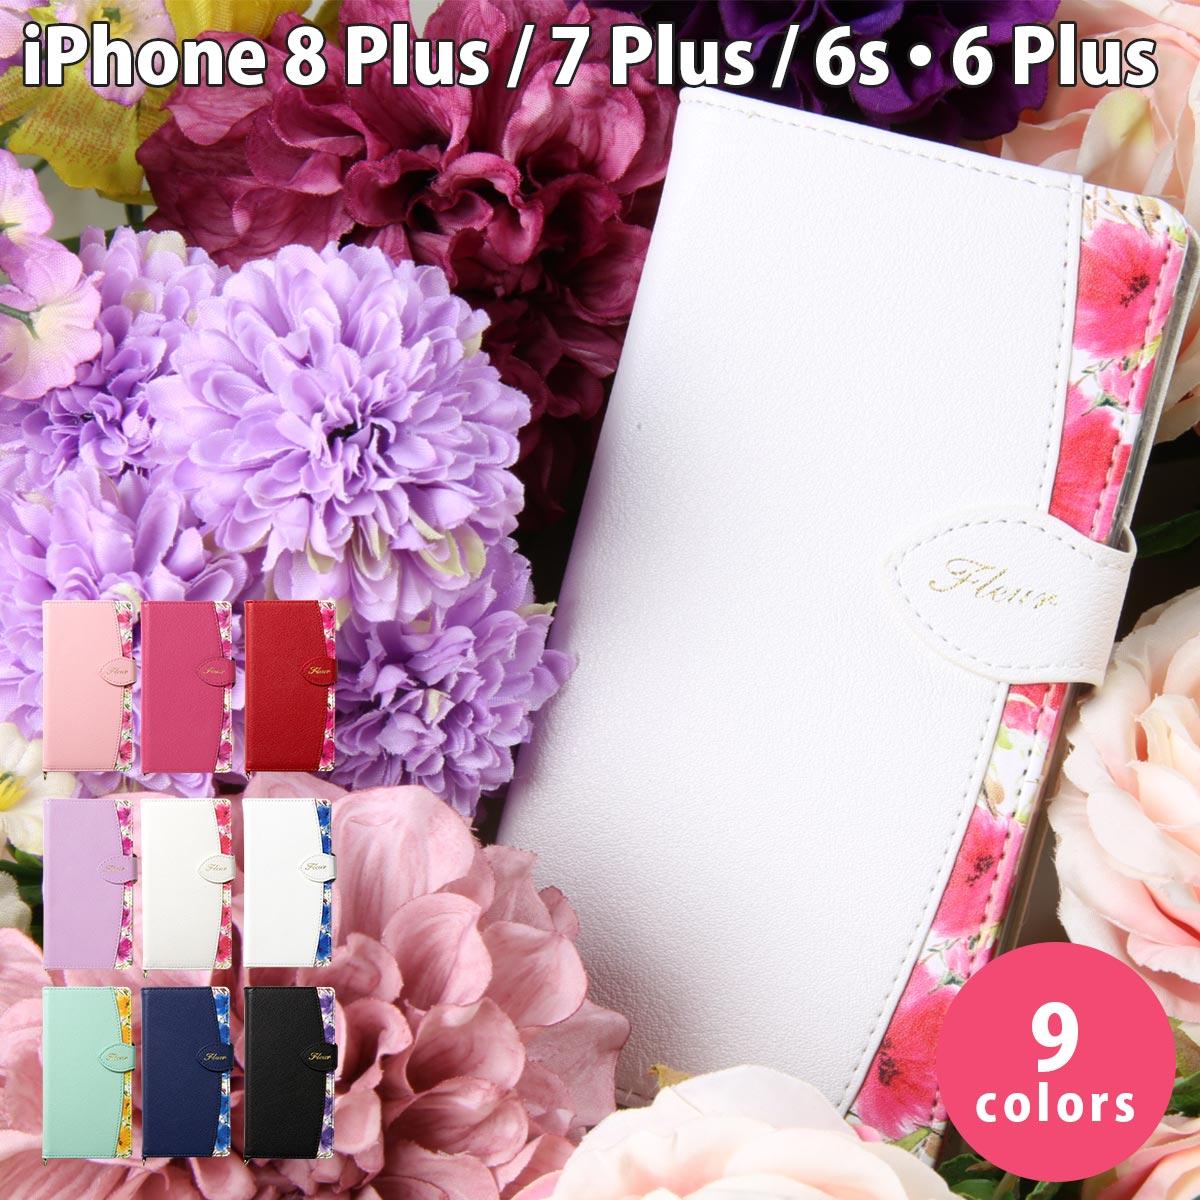 iPhone8Plus 7Plus 6Plus 6sPlus ケース 手帳型 スマホケース スマートフォン おしゃれ アイフォン 大人女子 ナチュラルデザイン NATURAL design FLEUR